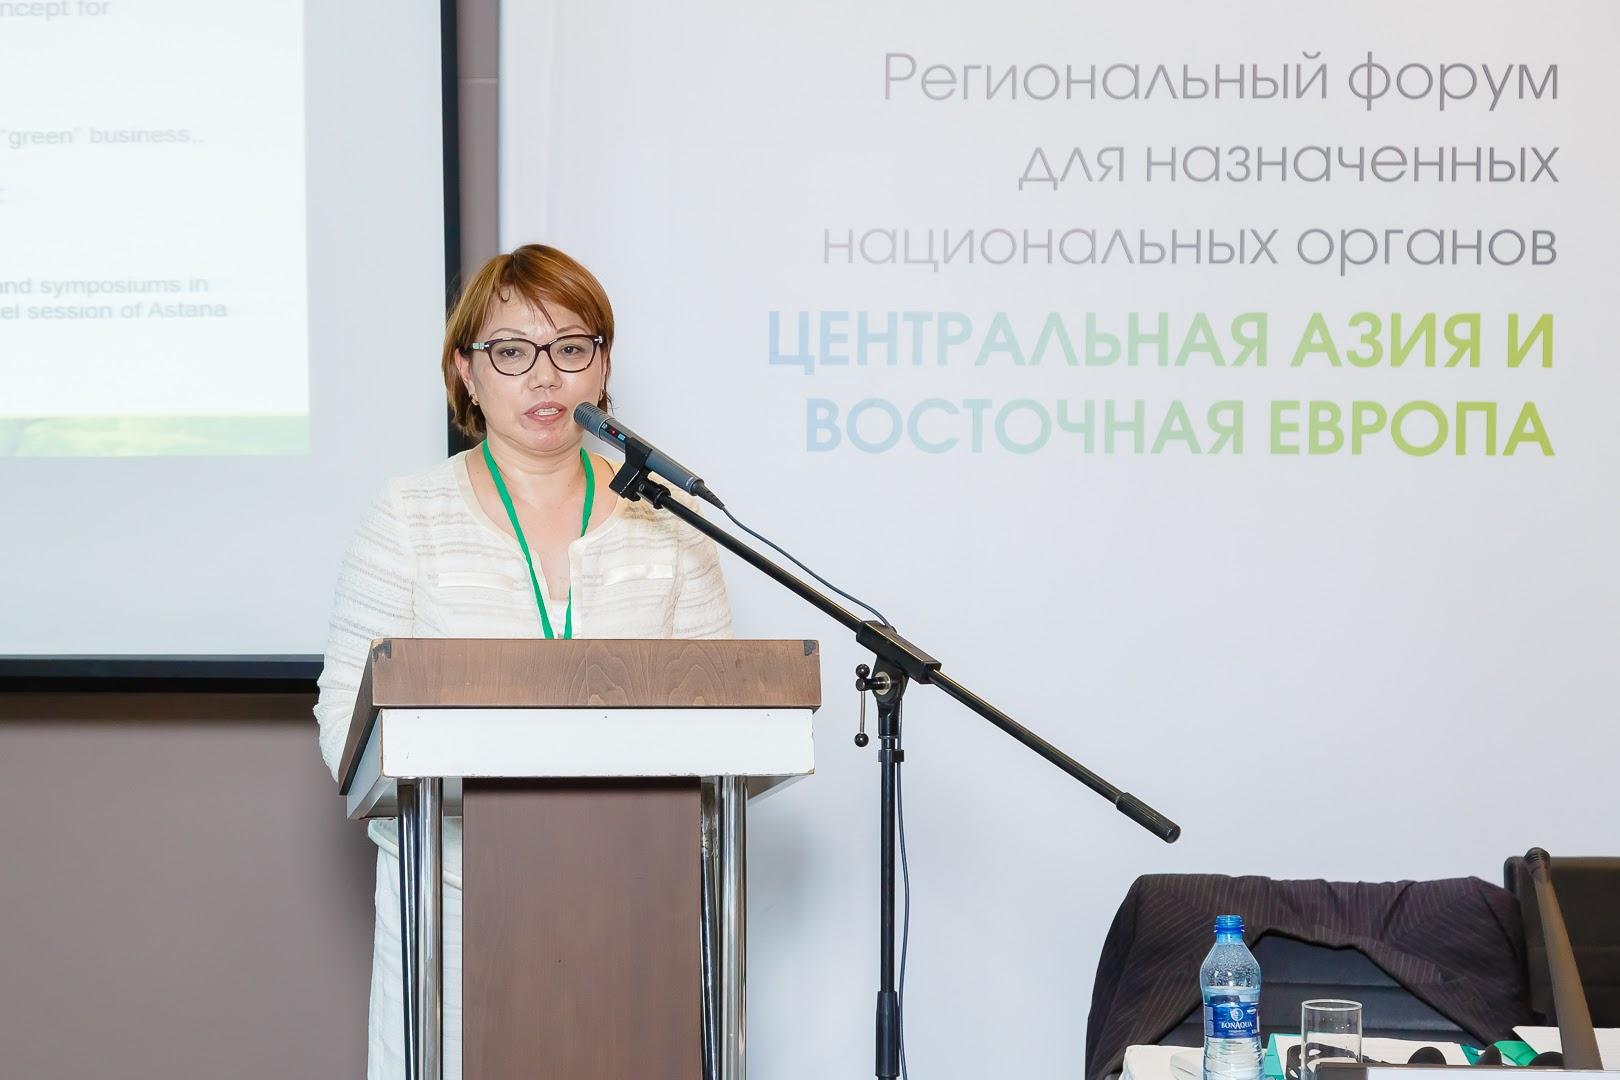 konferenciya_2016-300.jpg